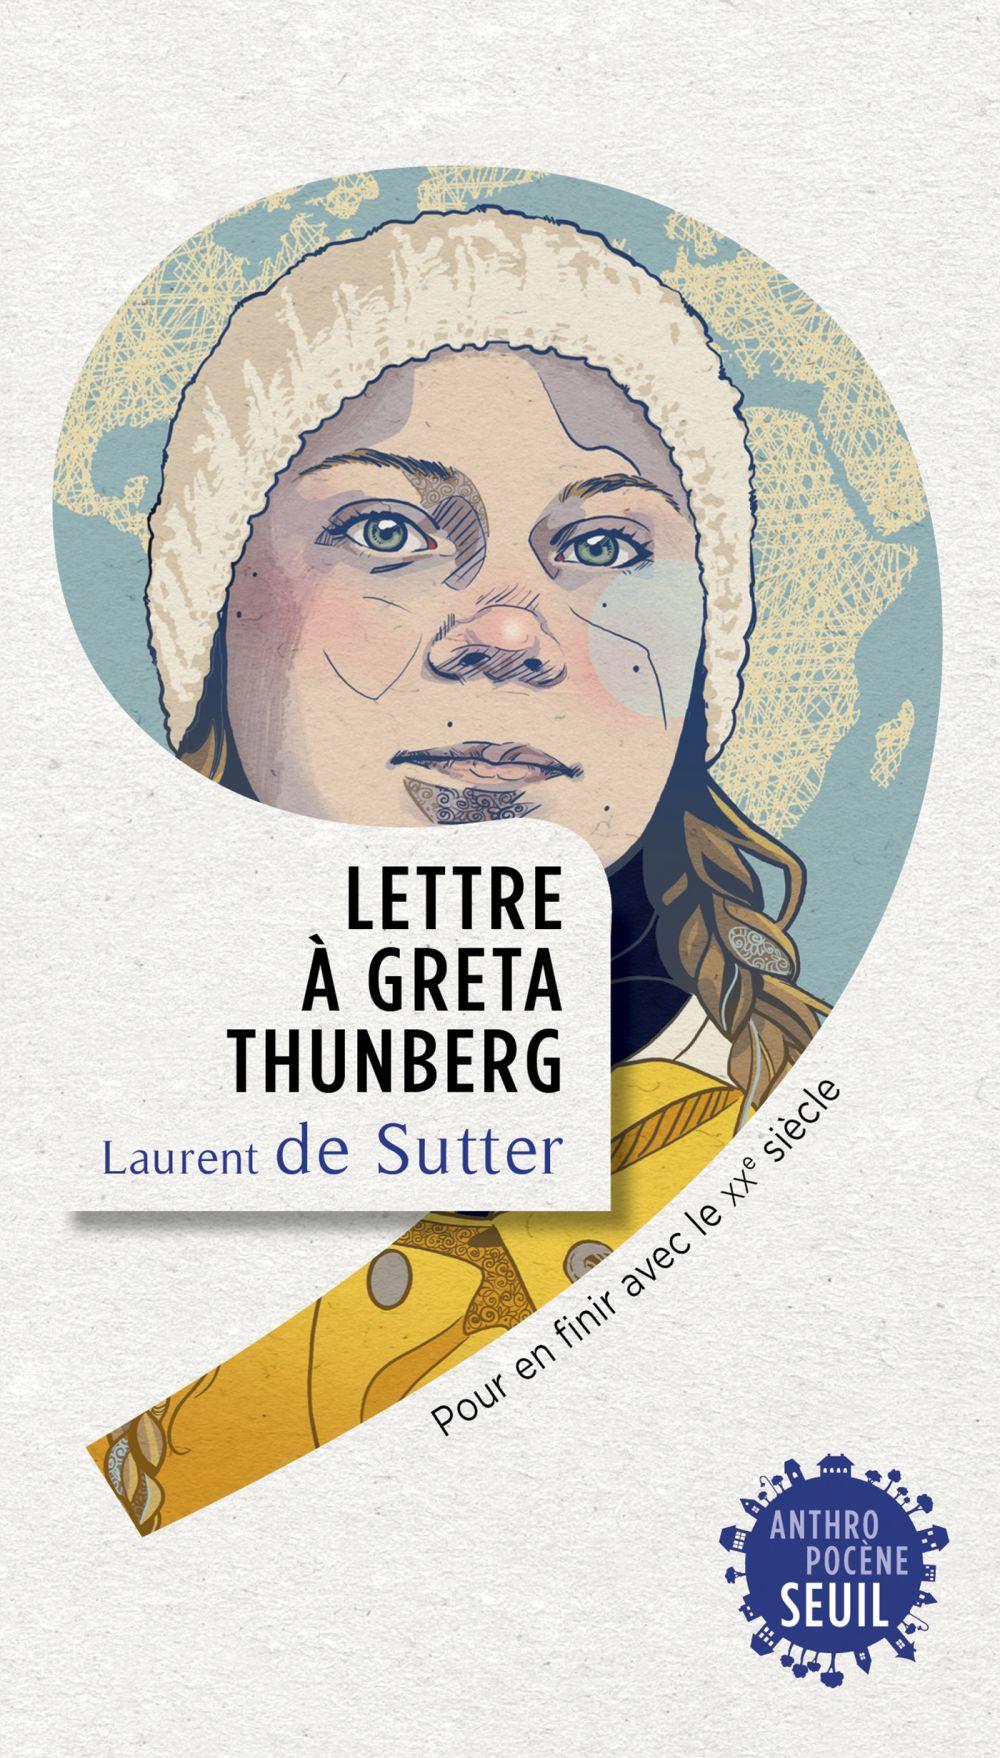 Lettre à Greta Thunberg |